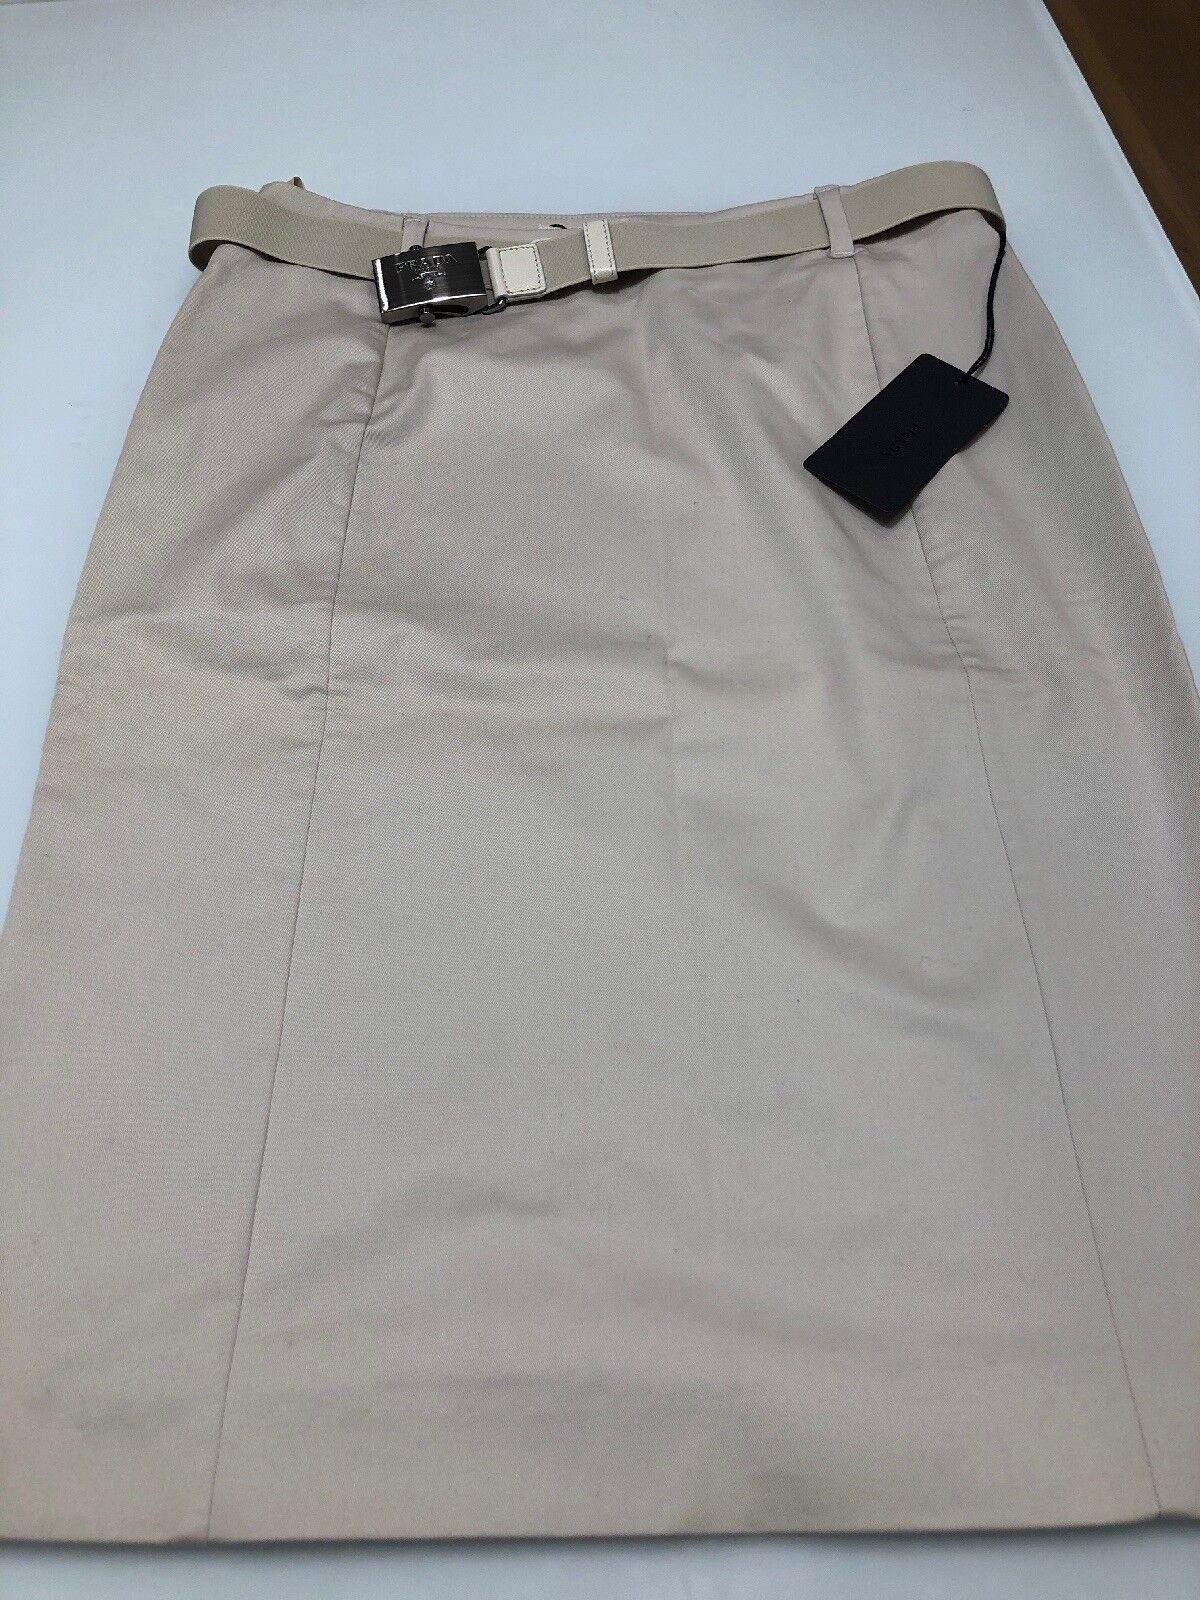 Prada Pencil Skirt With Belt SZ 40